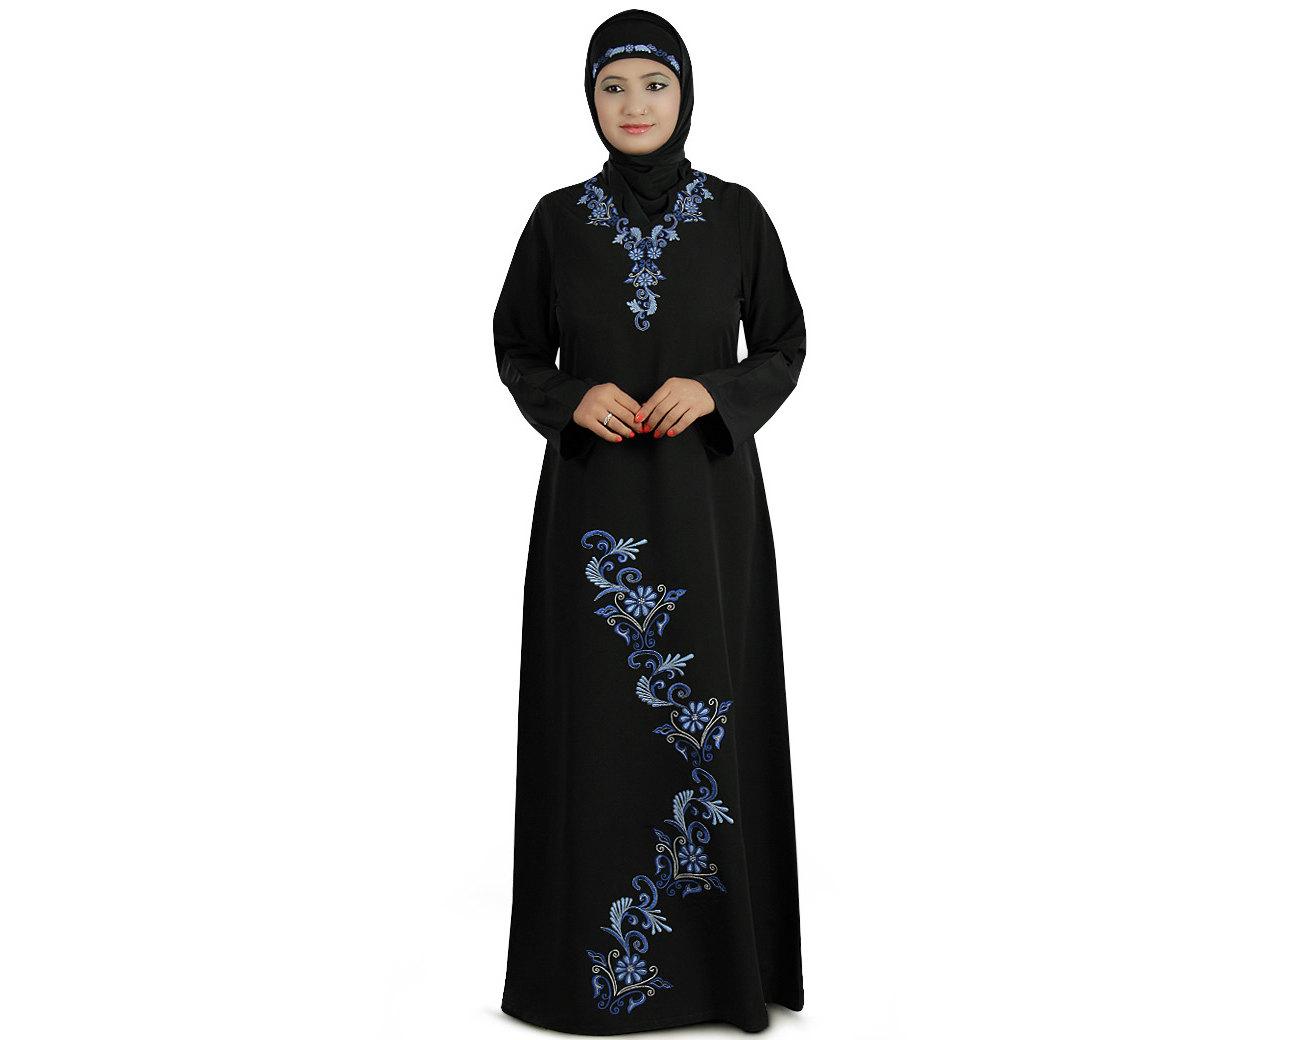 Abaya Embroidery Patterns Mybatua Traditional Black Embroidered Kashibo Abaya Islamic Evening And Party Wear Gown Elegant Muslim Clothing Jilbab Jalabiya Ay 203